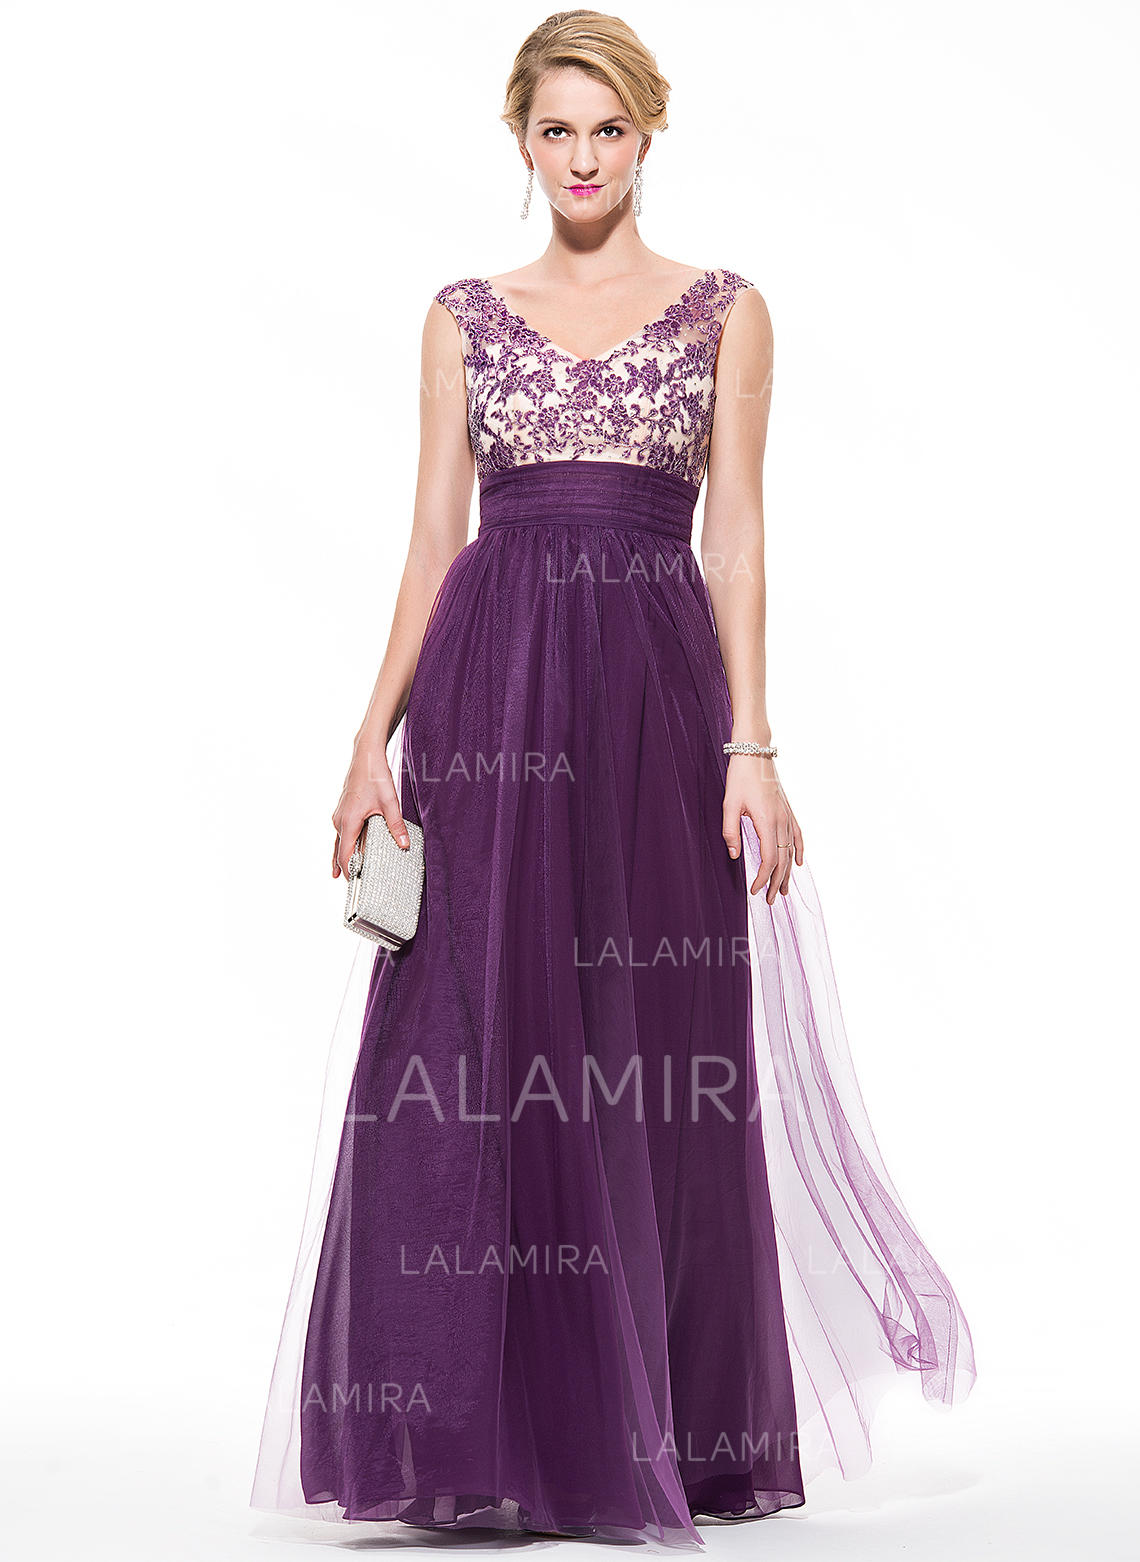 26196784fa1 Empire Tulle Prom Dresses Newest Floor-Length V-neck Sleeveless  (018075893). Loading zoom